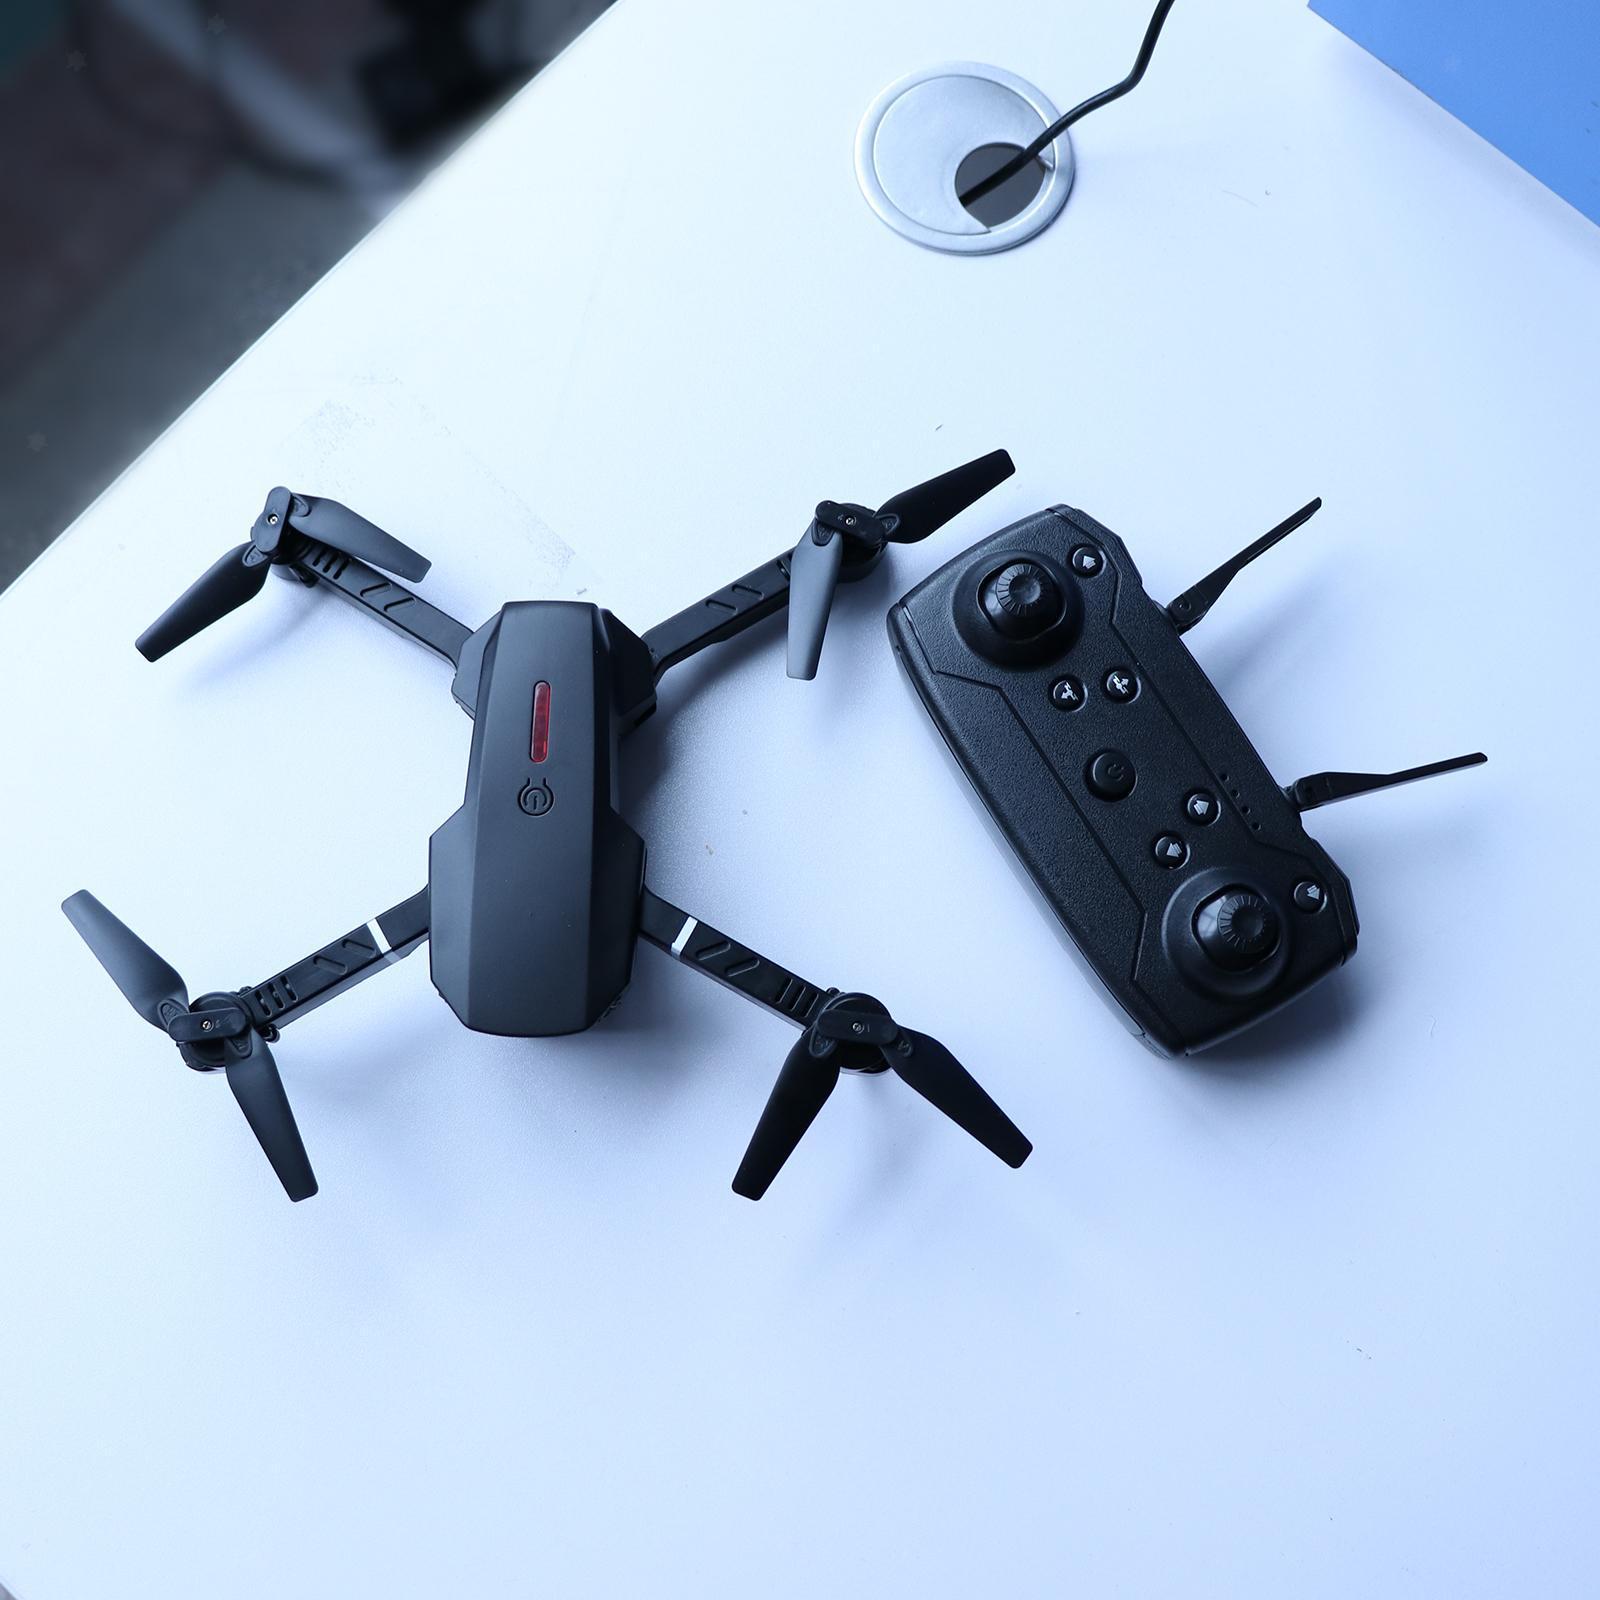 Quadcopter-Drohne-mit-Kamera-Live-Video-E88-Pro-WiFi-FPV-Quadcopter-120-FOV Indexbild 9